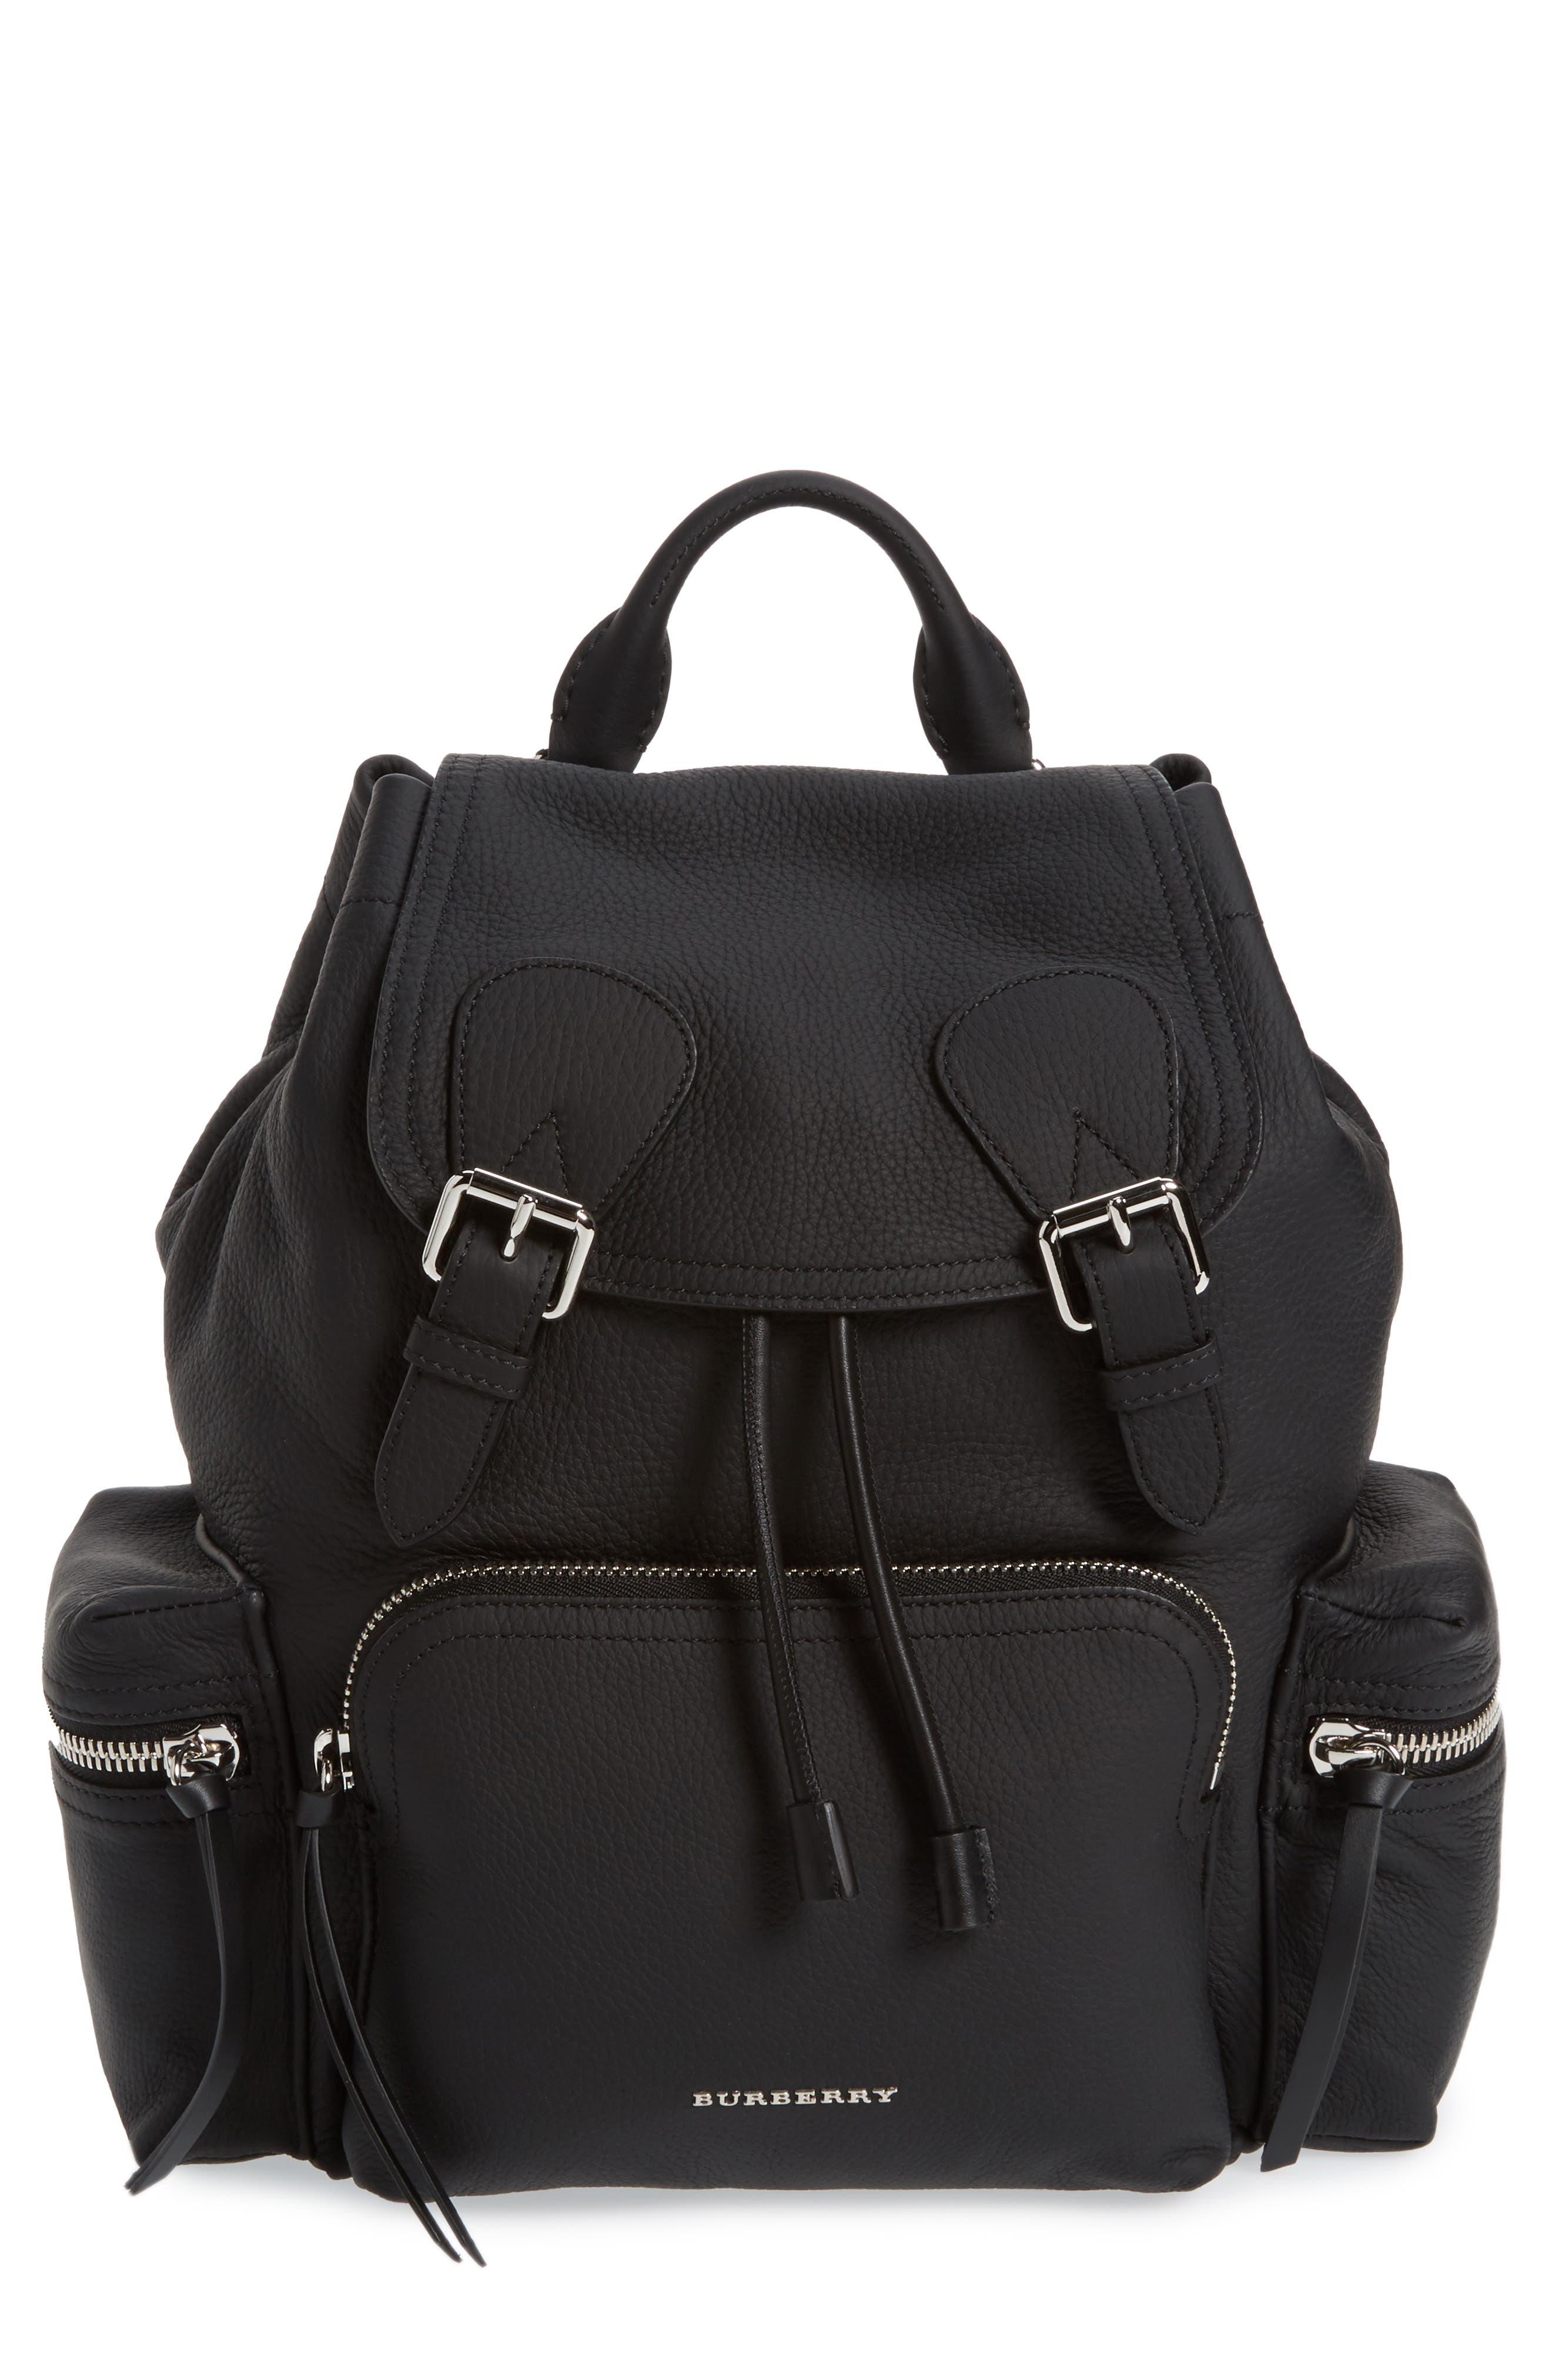 Main Image - Burberry Medium Rucksack Leather Backpack